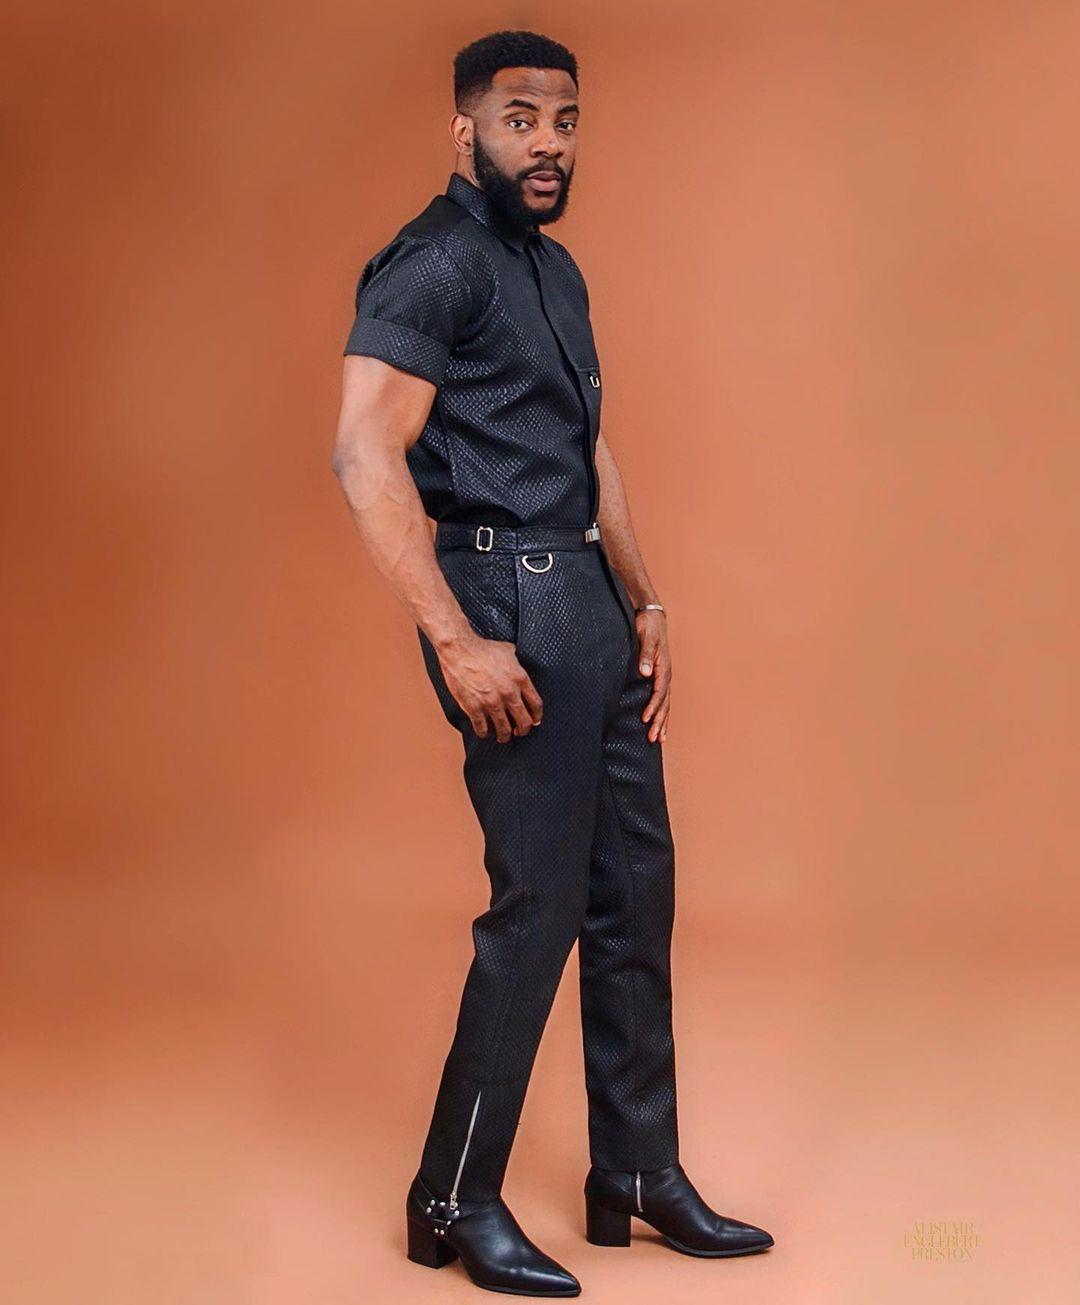 best-men-style-ankara-suit-nigerian-celeb-ebuka-obi-uchendu